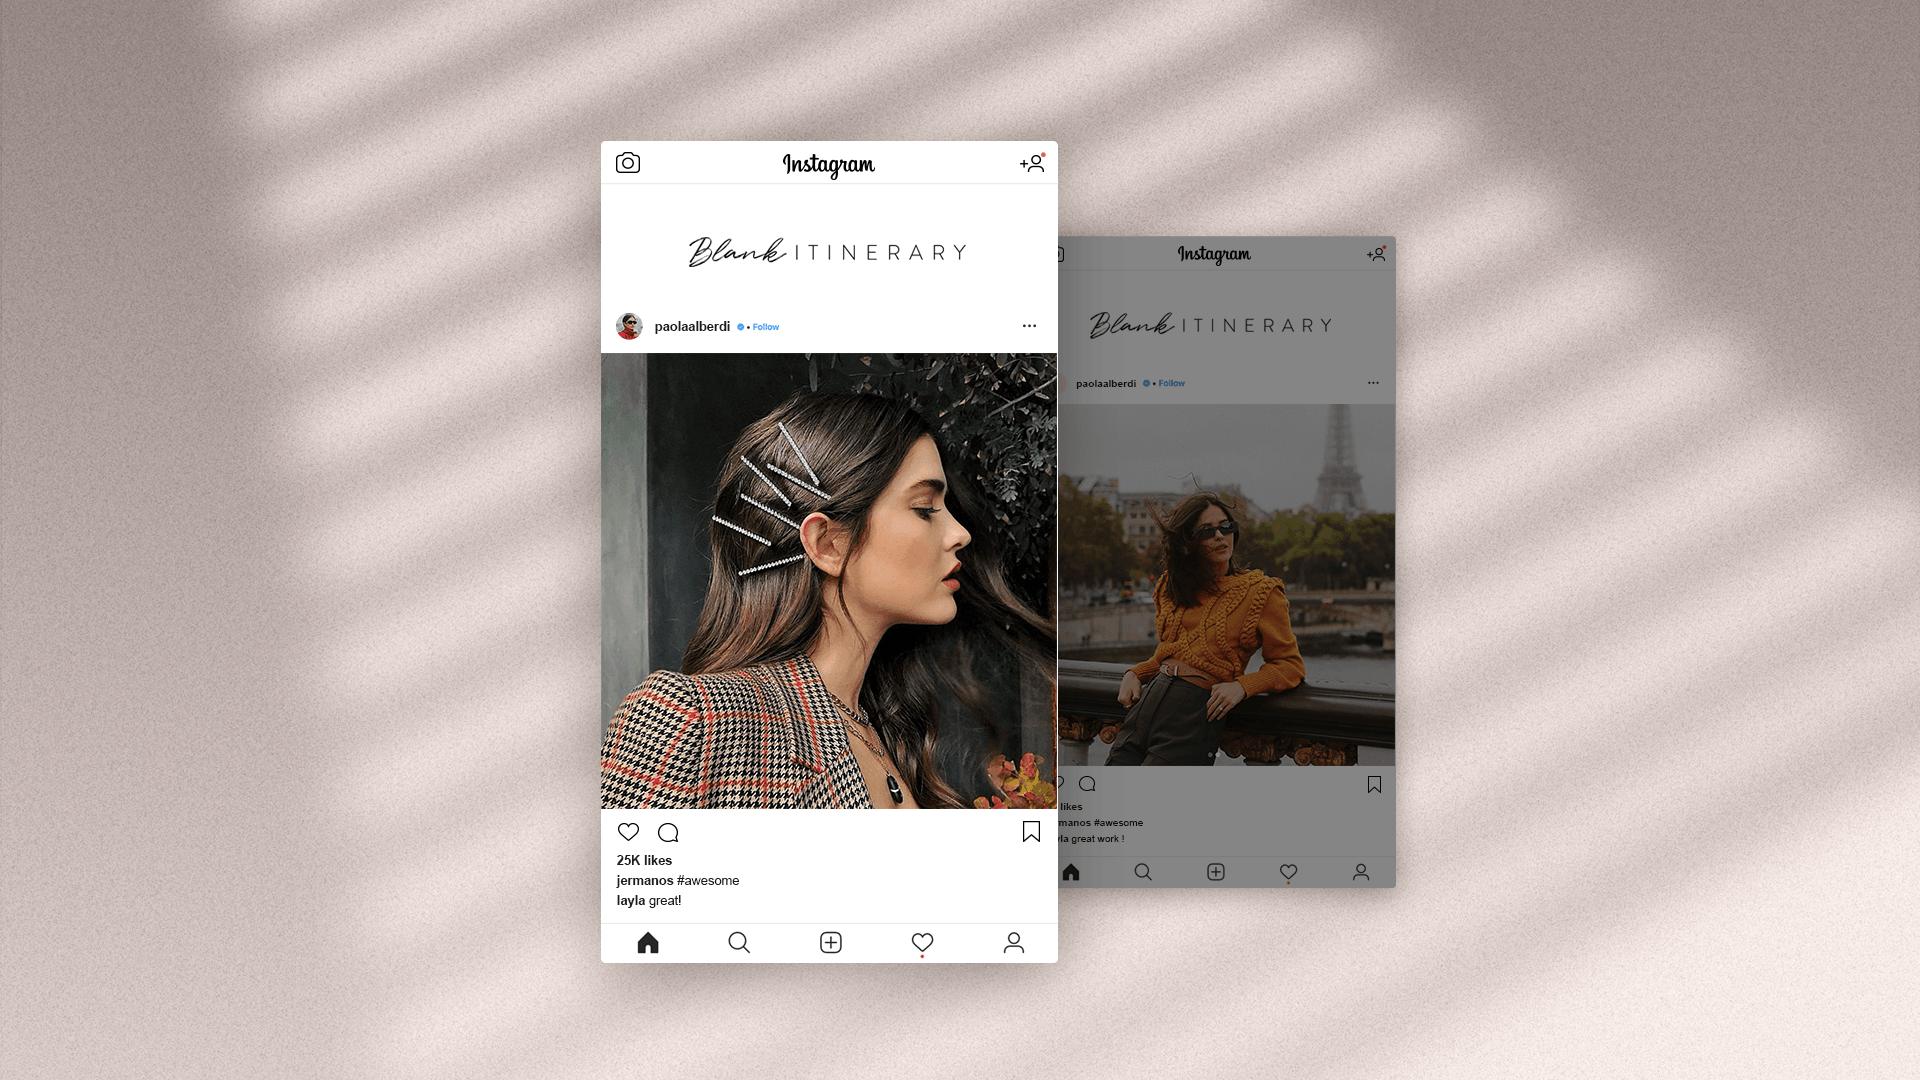 instagram-blank-itinerary-yoenpaperland